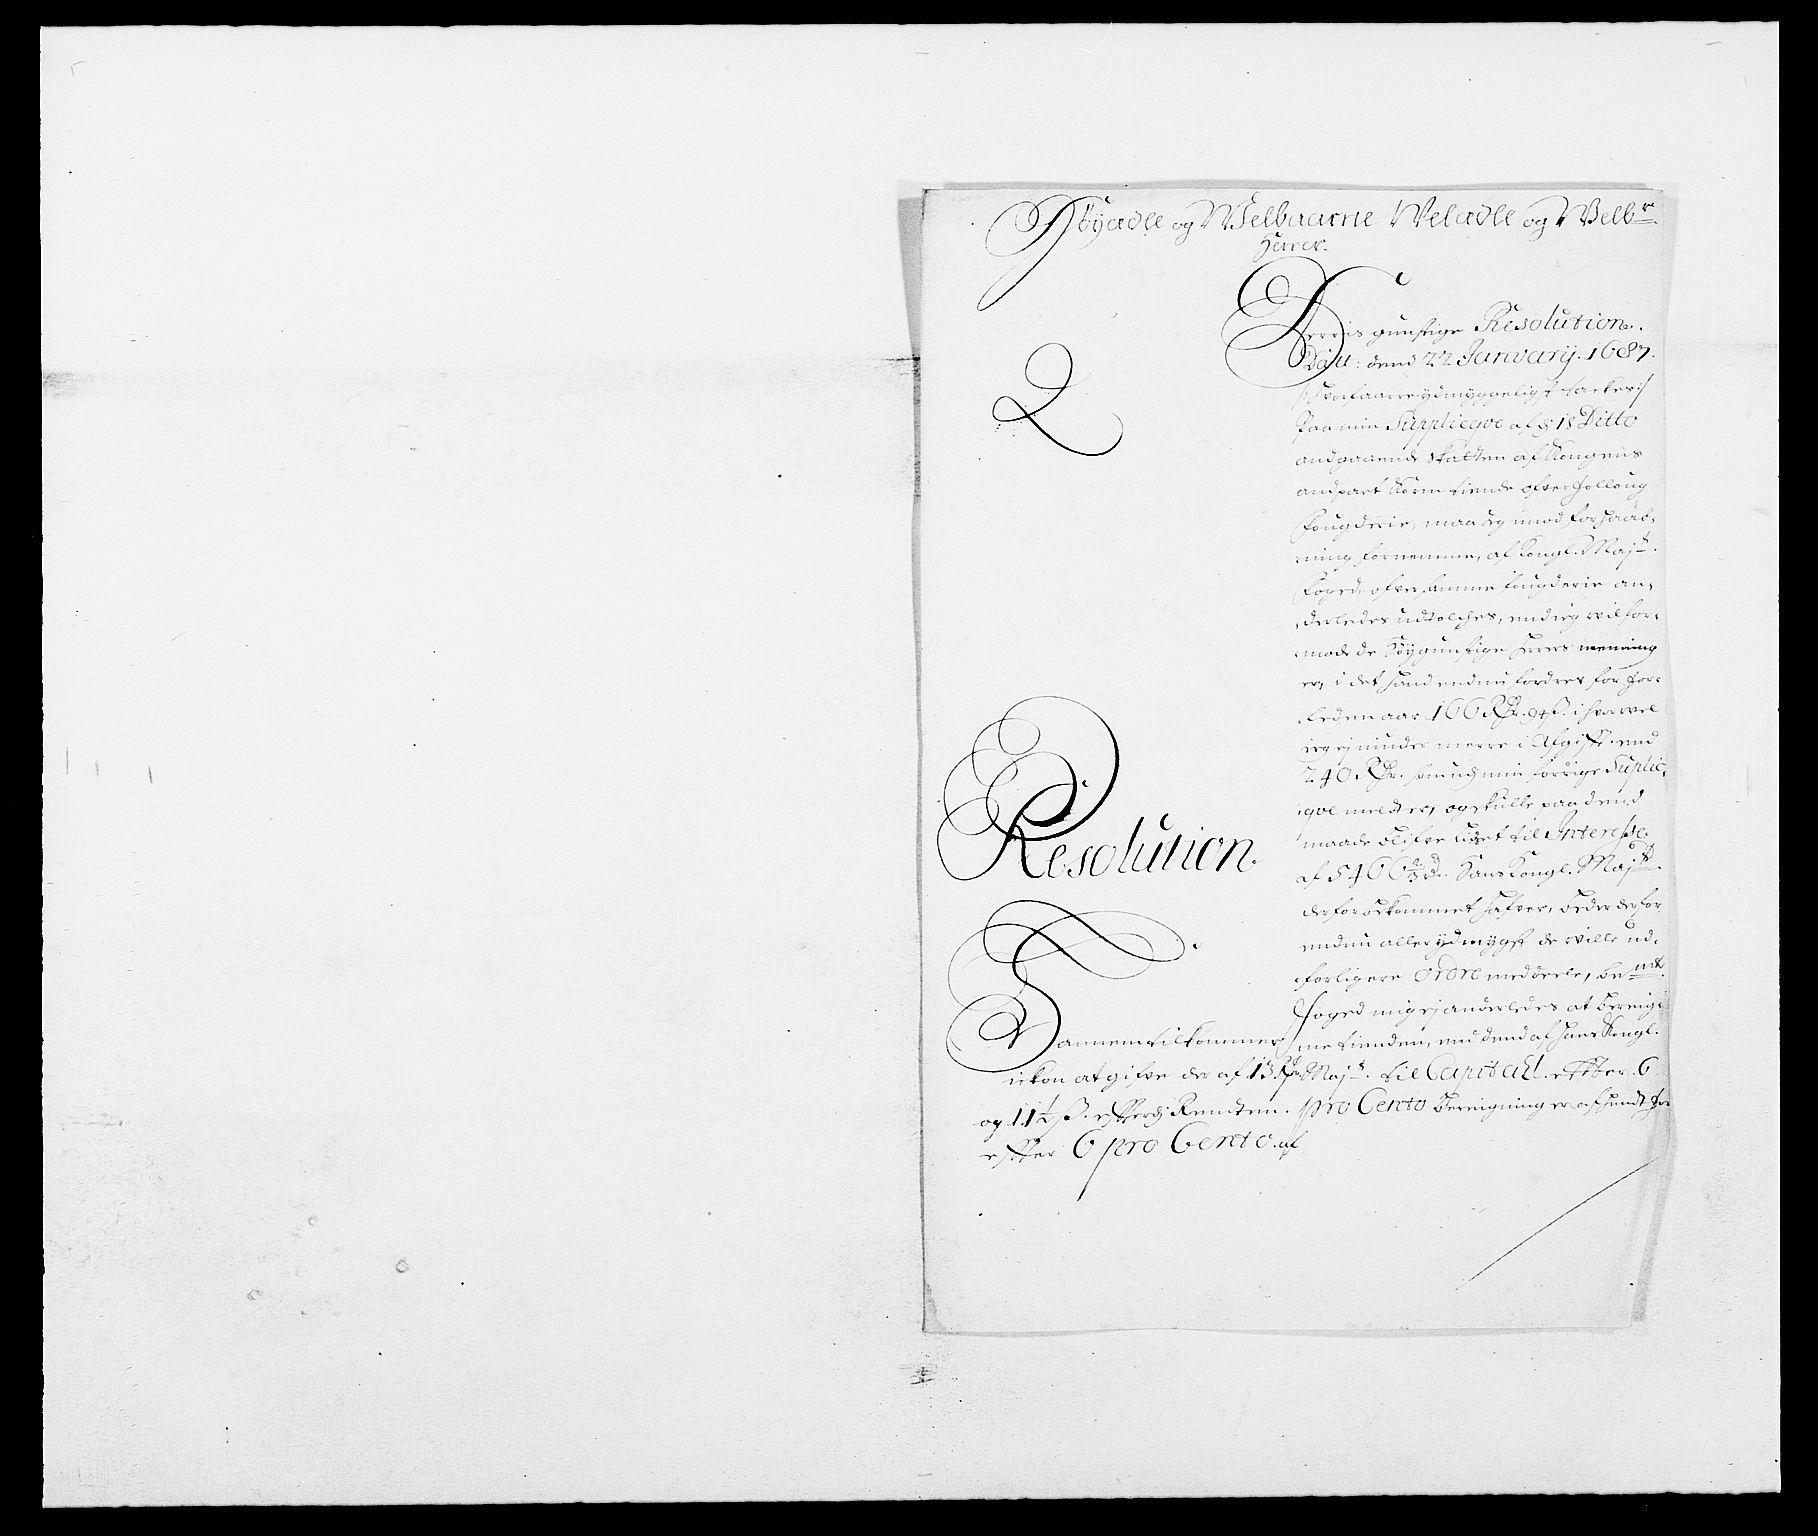 RA, Rentekammeret inntil 1814, Reviderte regnskaper, Fogderegnskap, R09/L0433: Fogderegnskap Follo, 1685-1686, s. 424